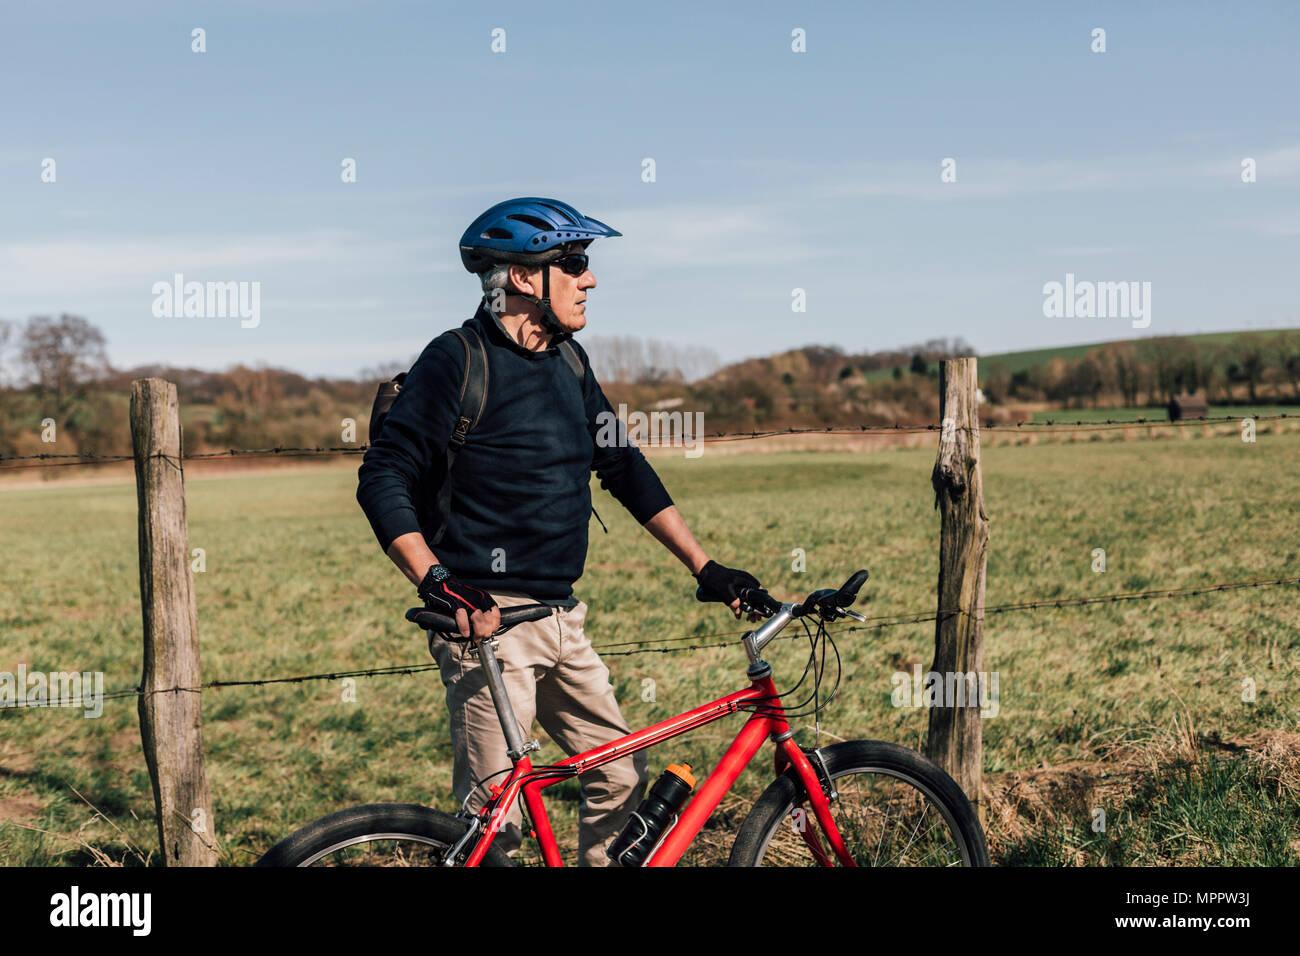 Mountainbiker avec casque de vélo Photo Stock